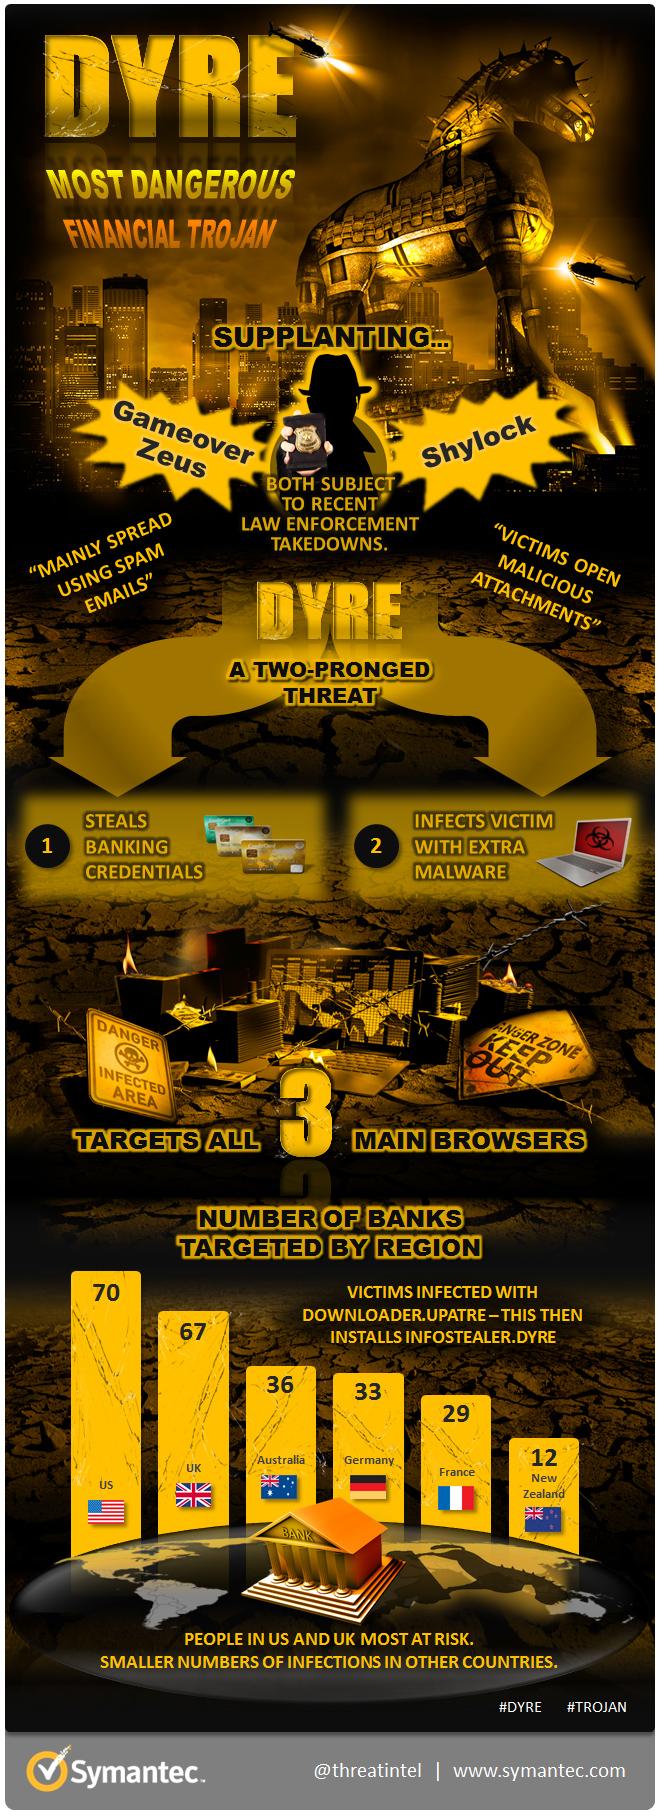 dyre-infographic_1.jpg